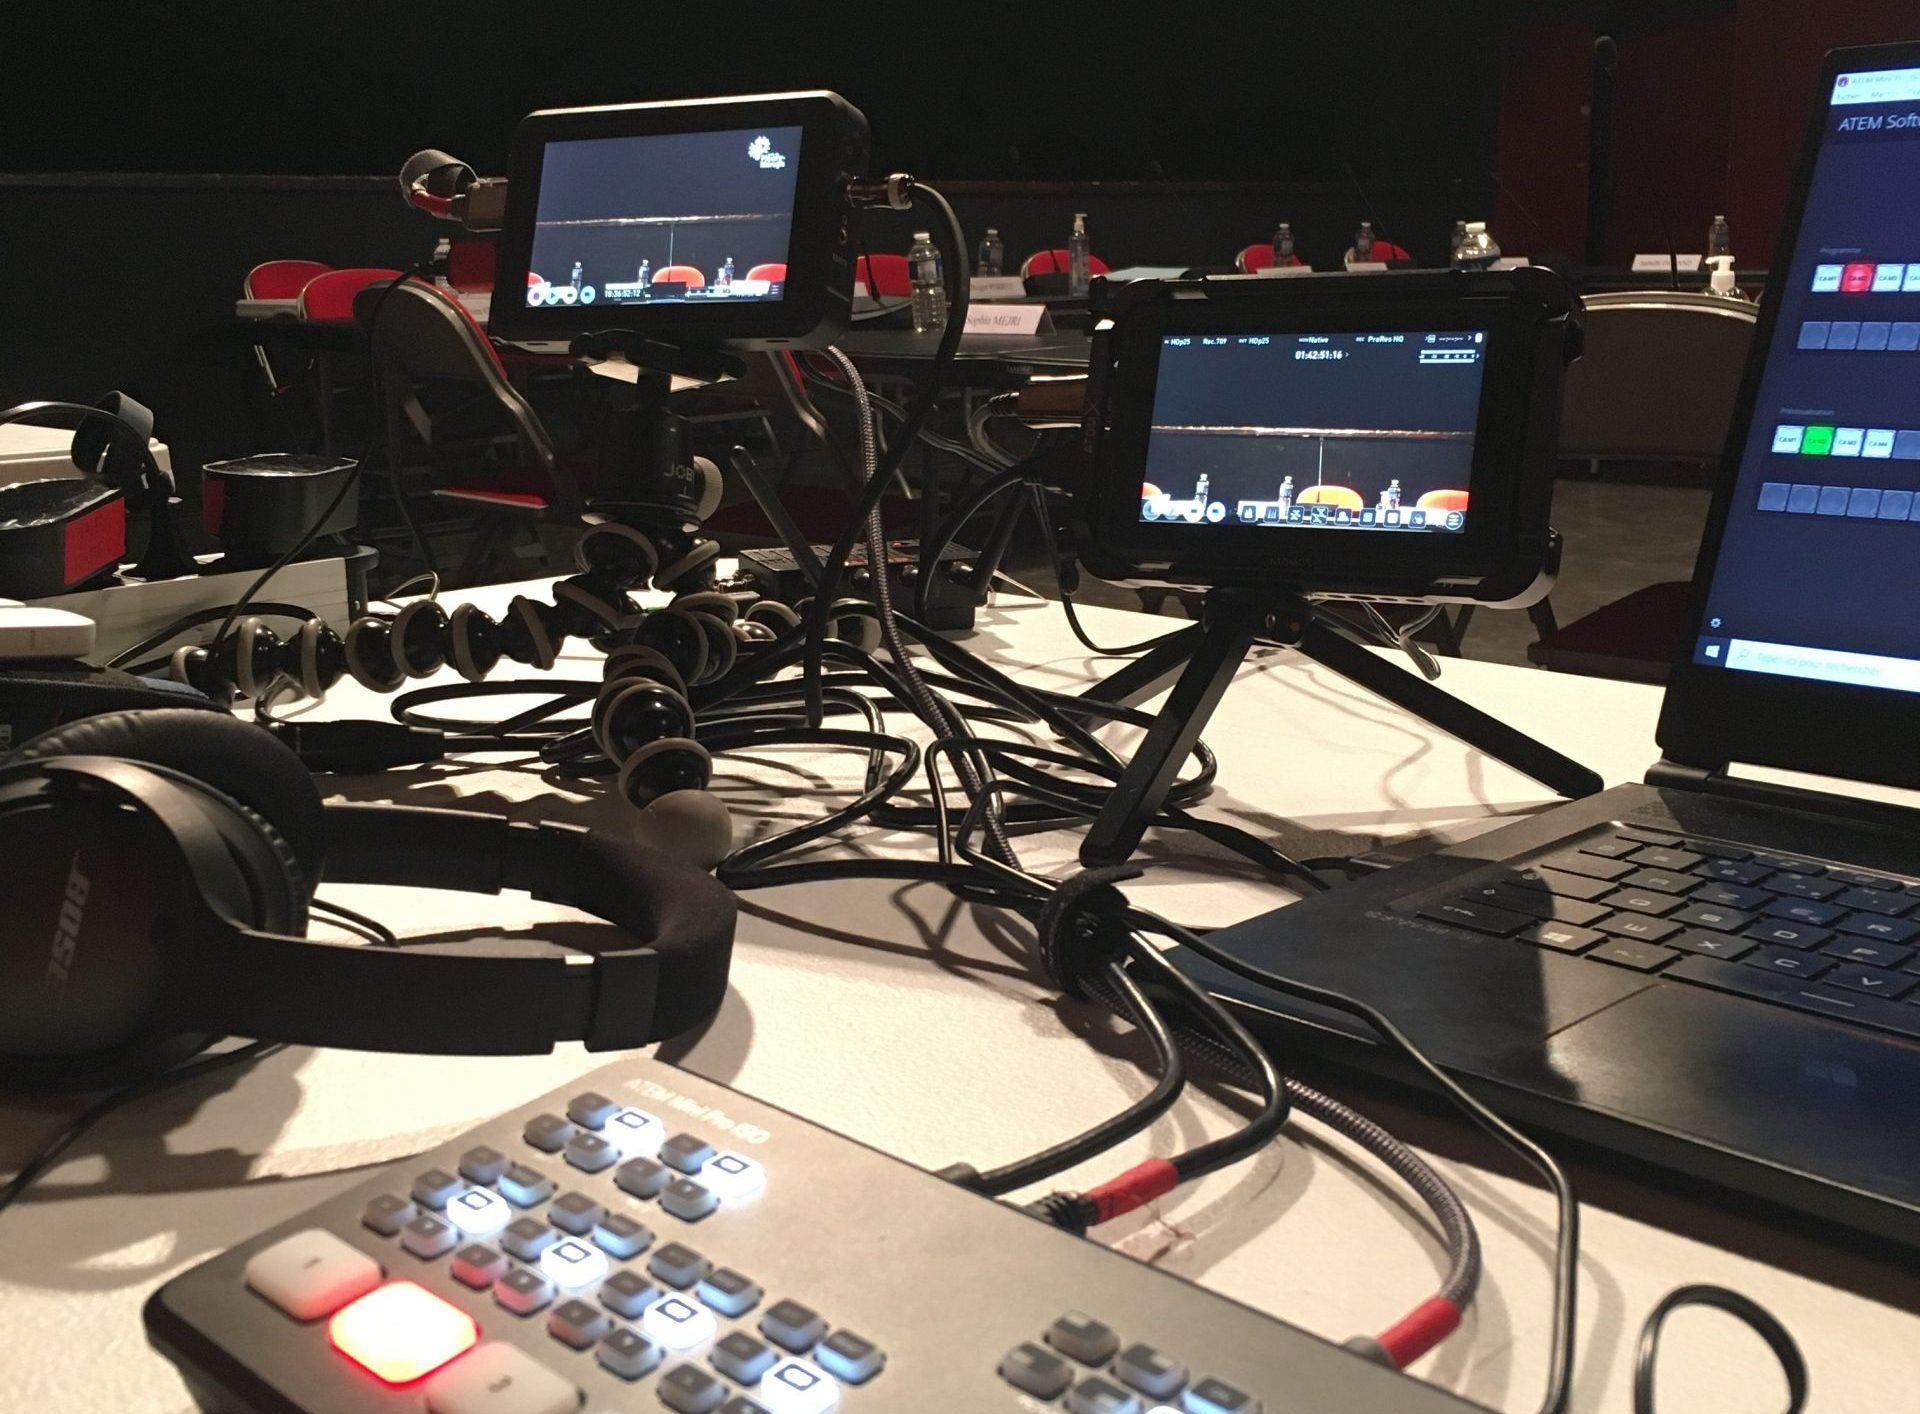 studio-podcast-audio-regie-video-live-bordeaux-xaleo-leo-meslet